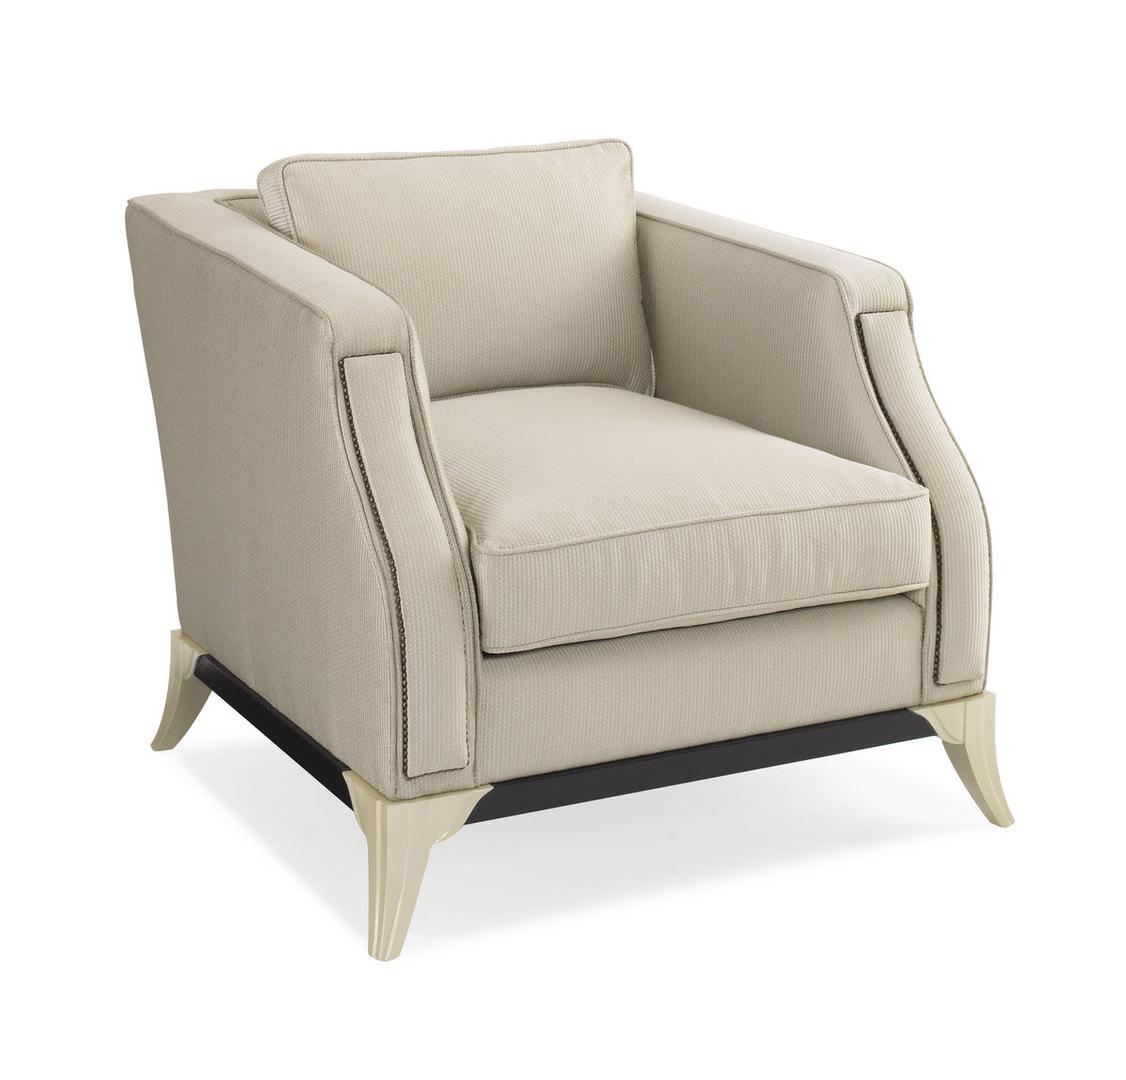 Furniture Royal High End Furniture Home Interior Design